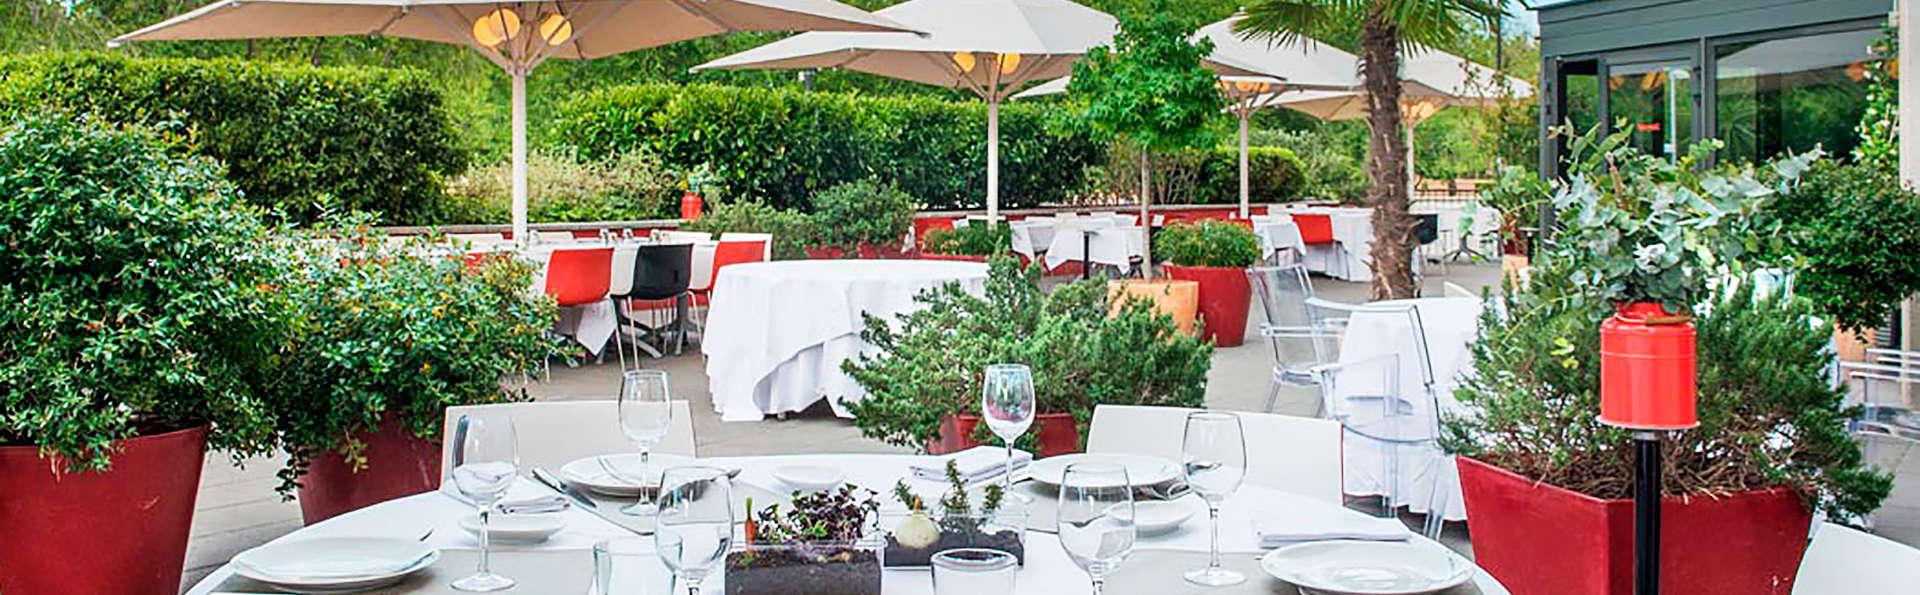 Escapadas fin de semana con cena sant cugat del vall s con cena para 2 adultos desde 115 - Spa sant cugat ...